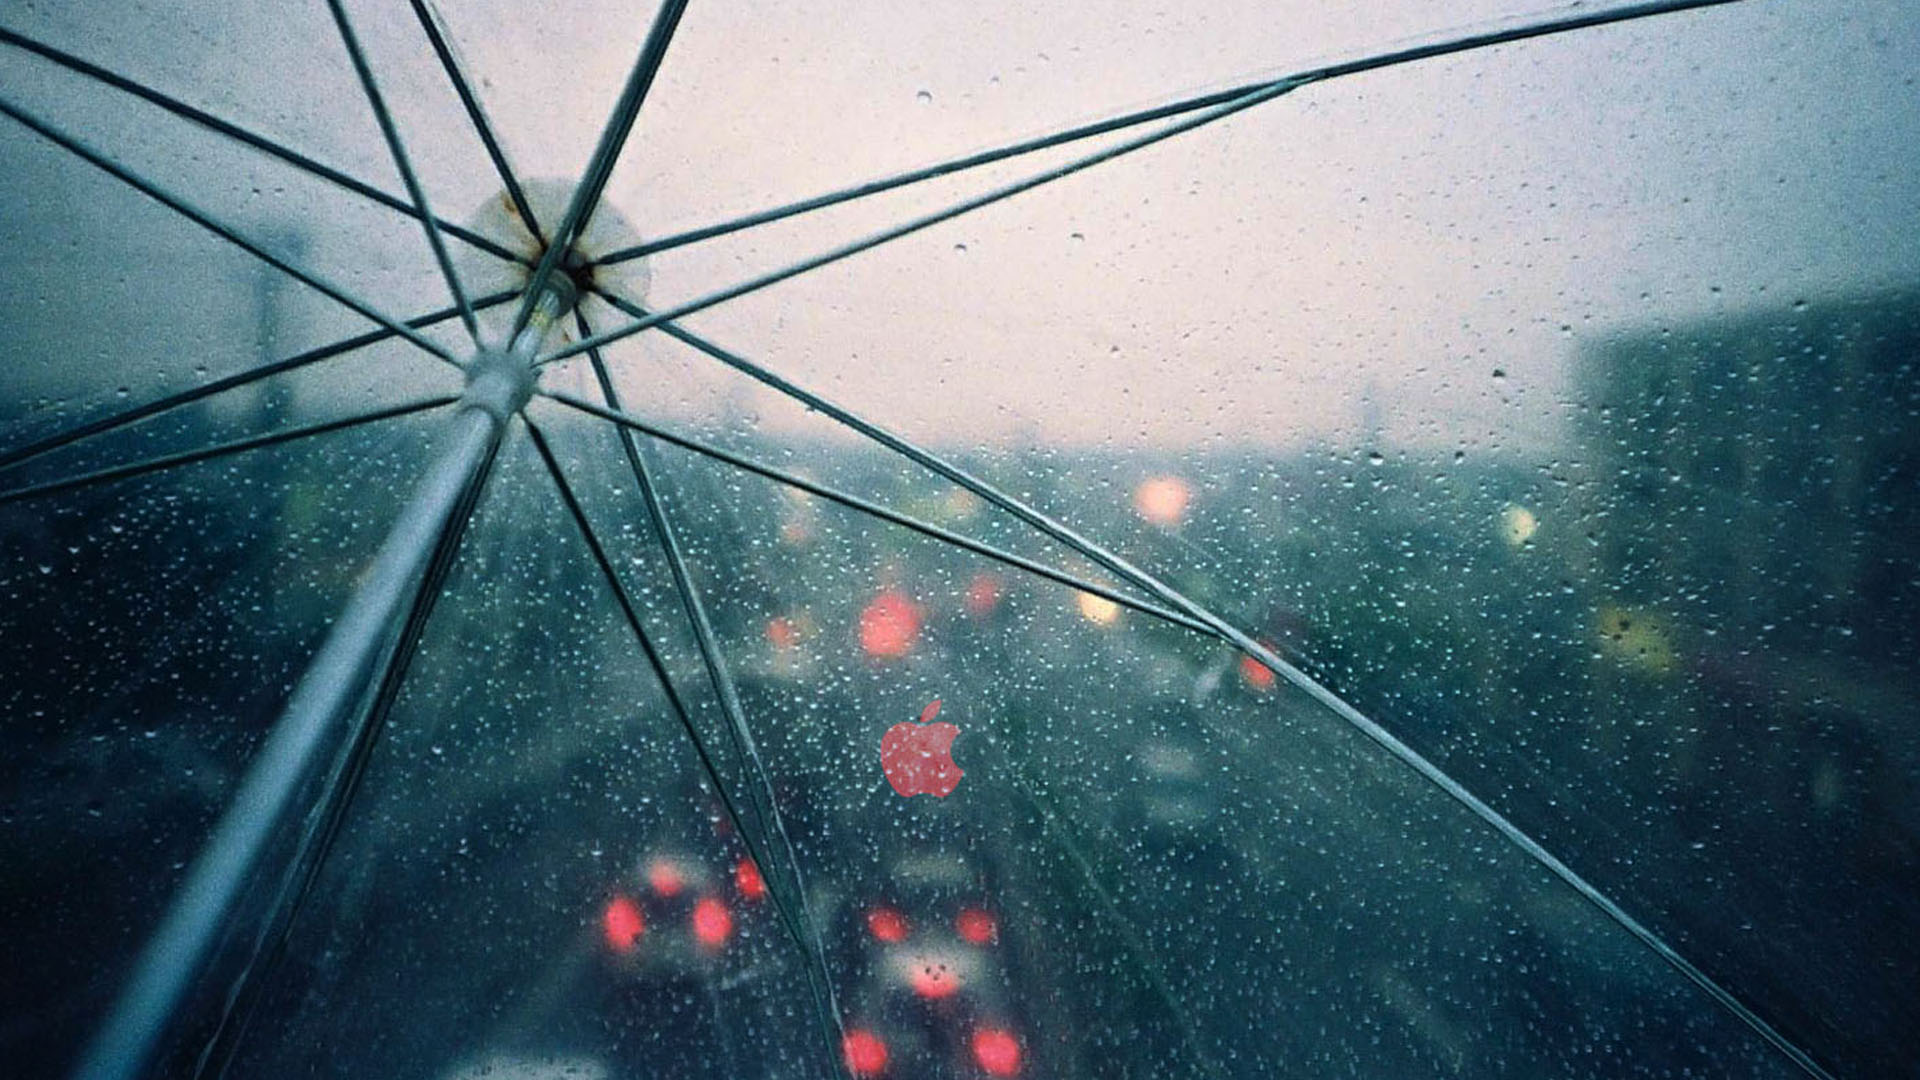 Cool Anime Wallpaper in Rain with Umbrella Rain Drops HD ...